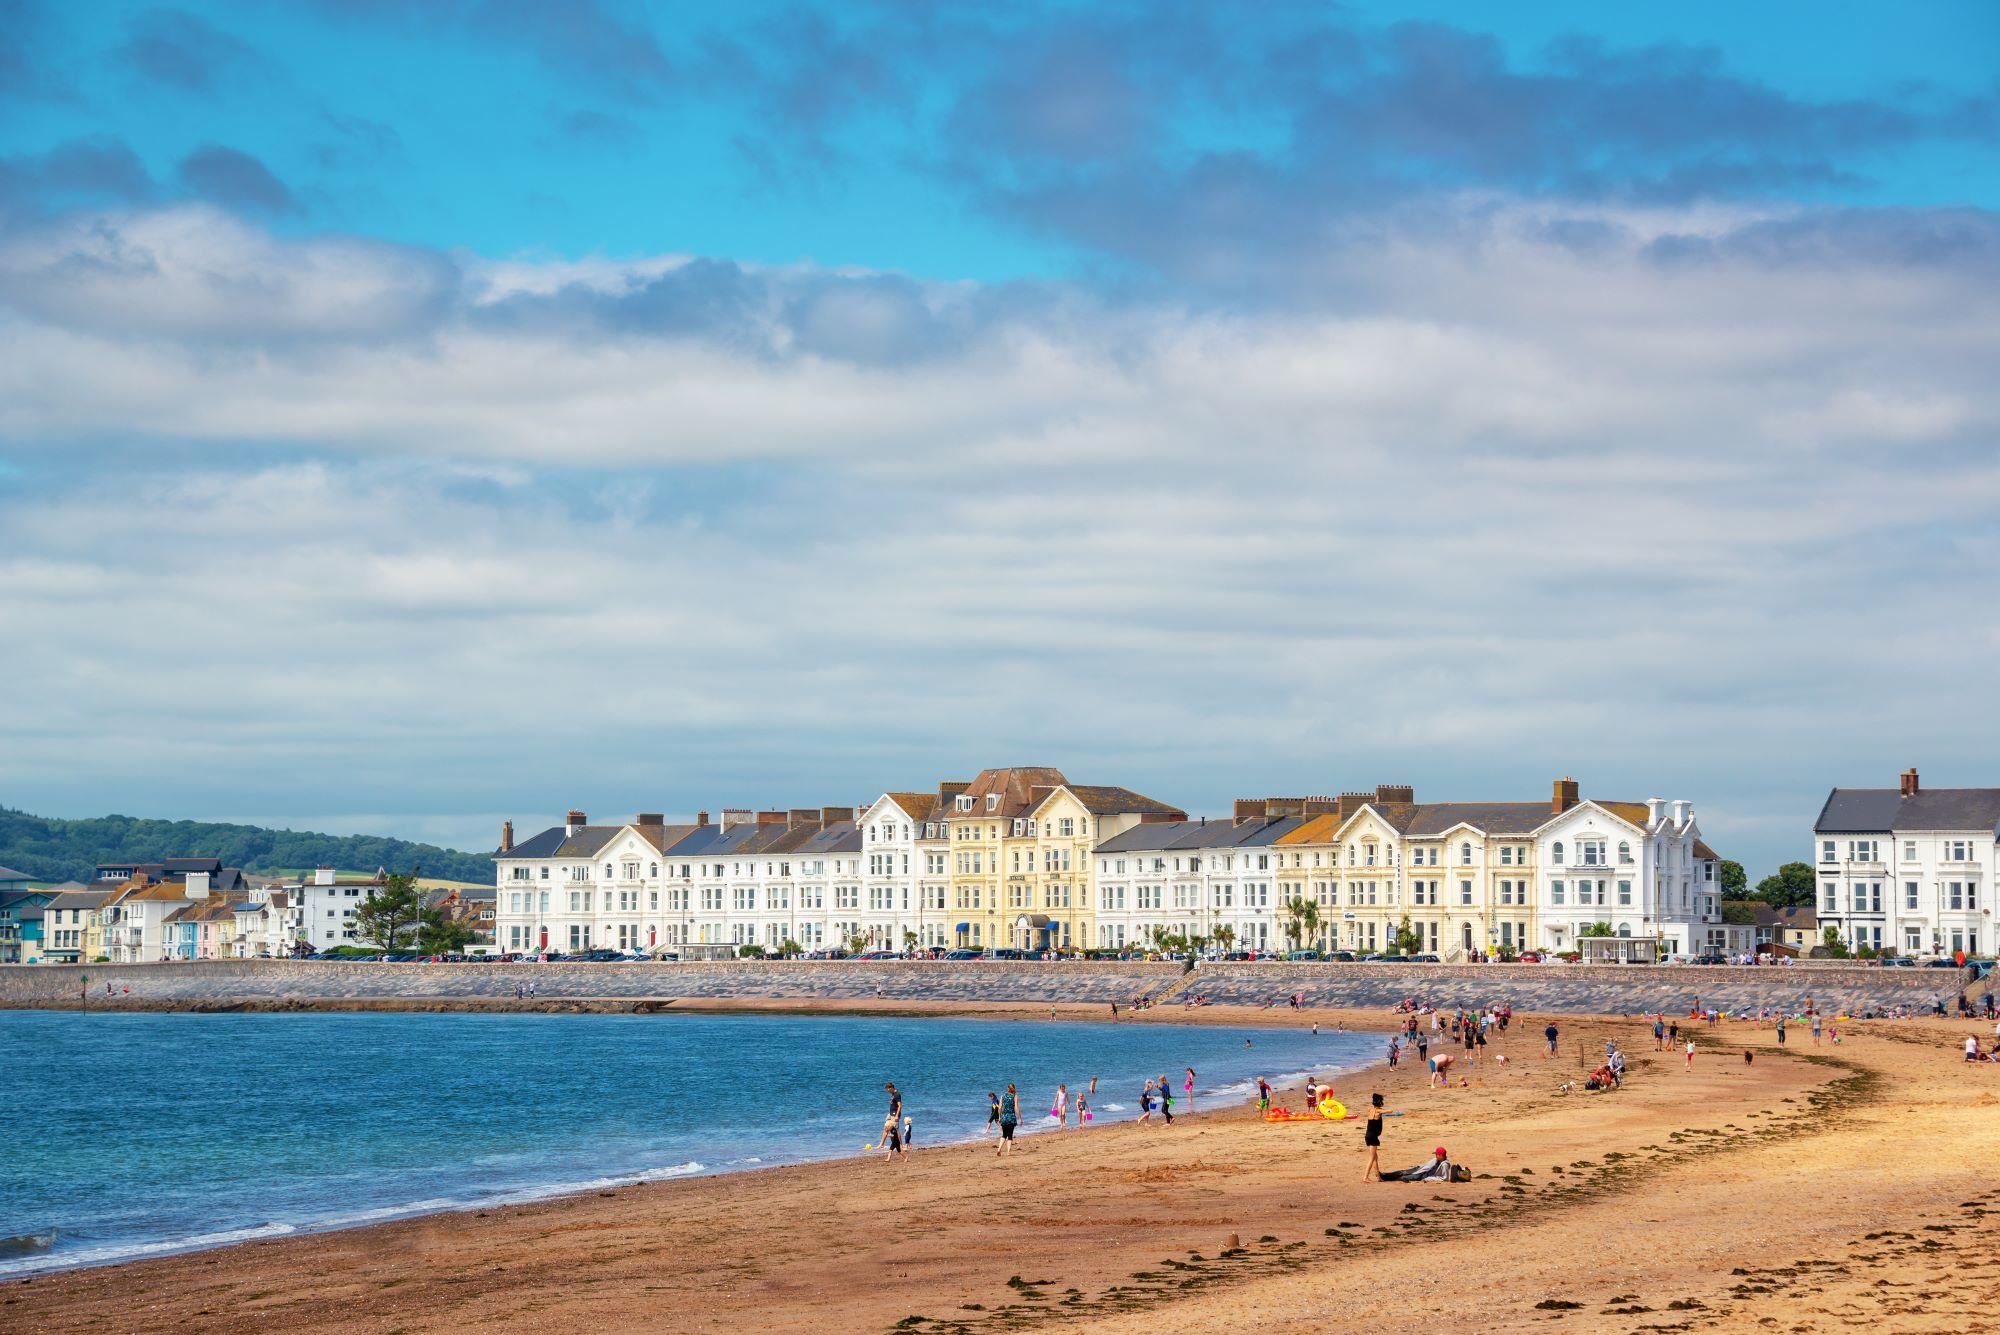 The Best Summer Holiday Activities in Devon